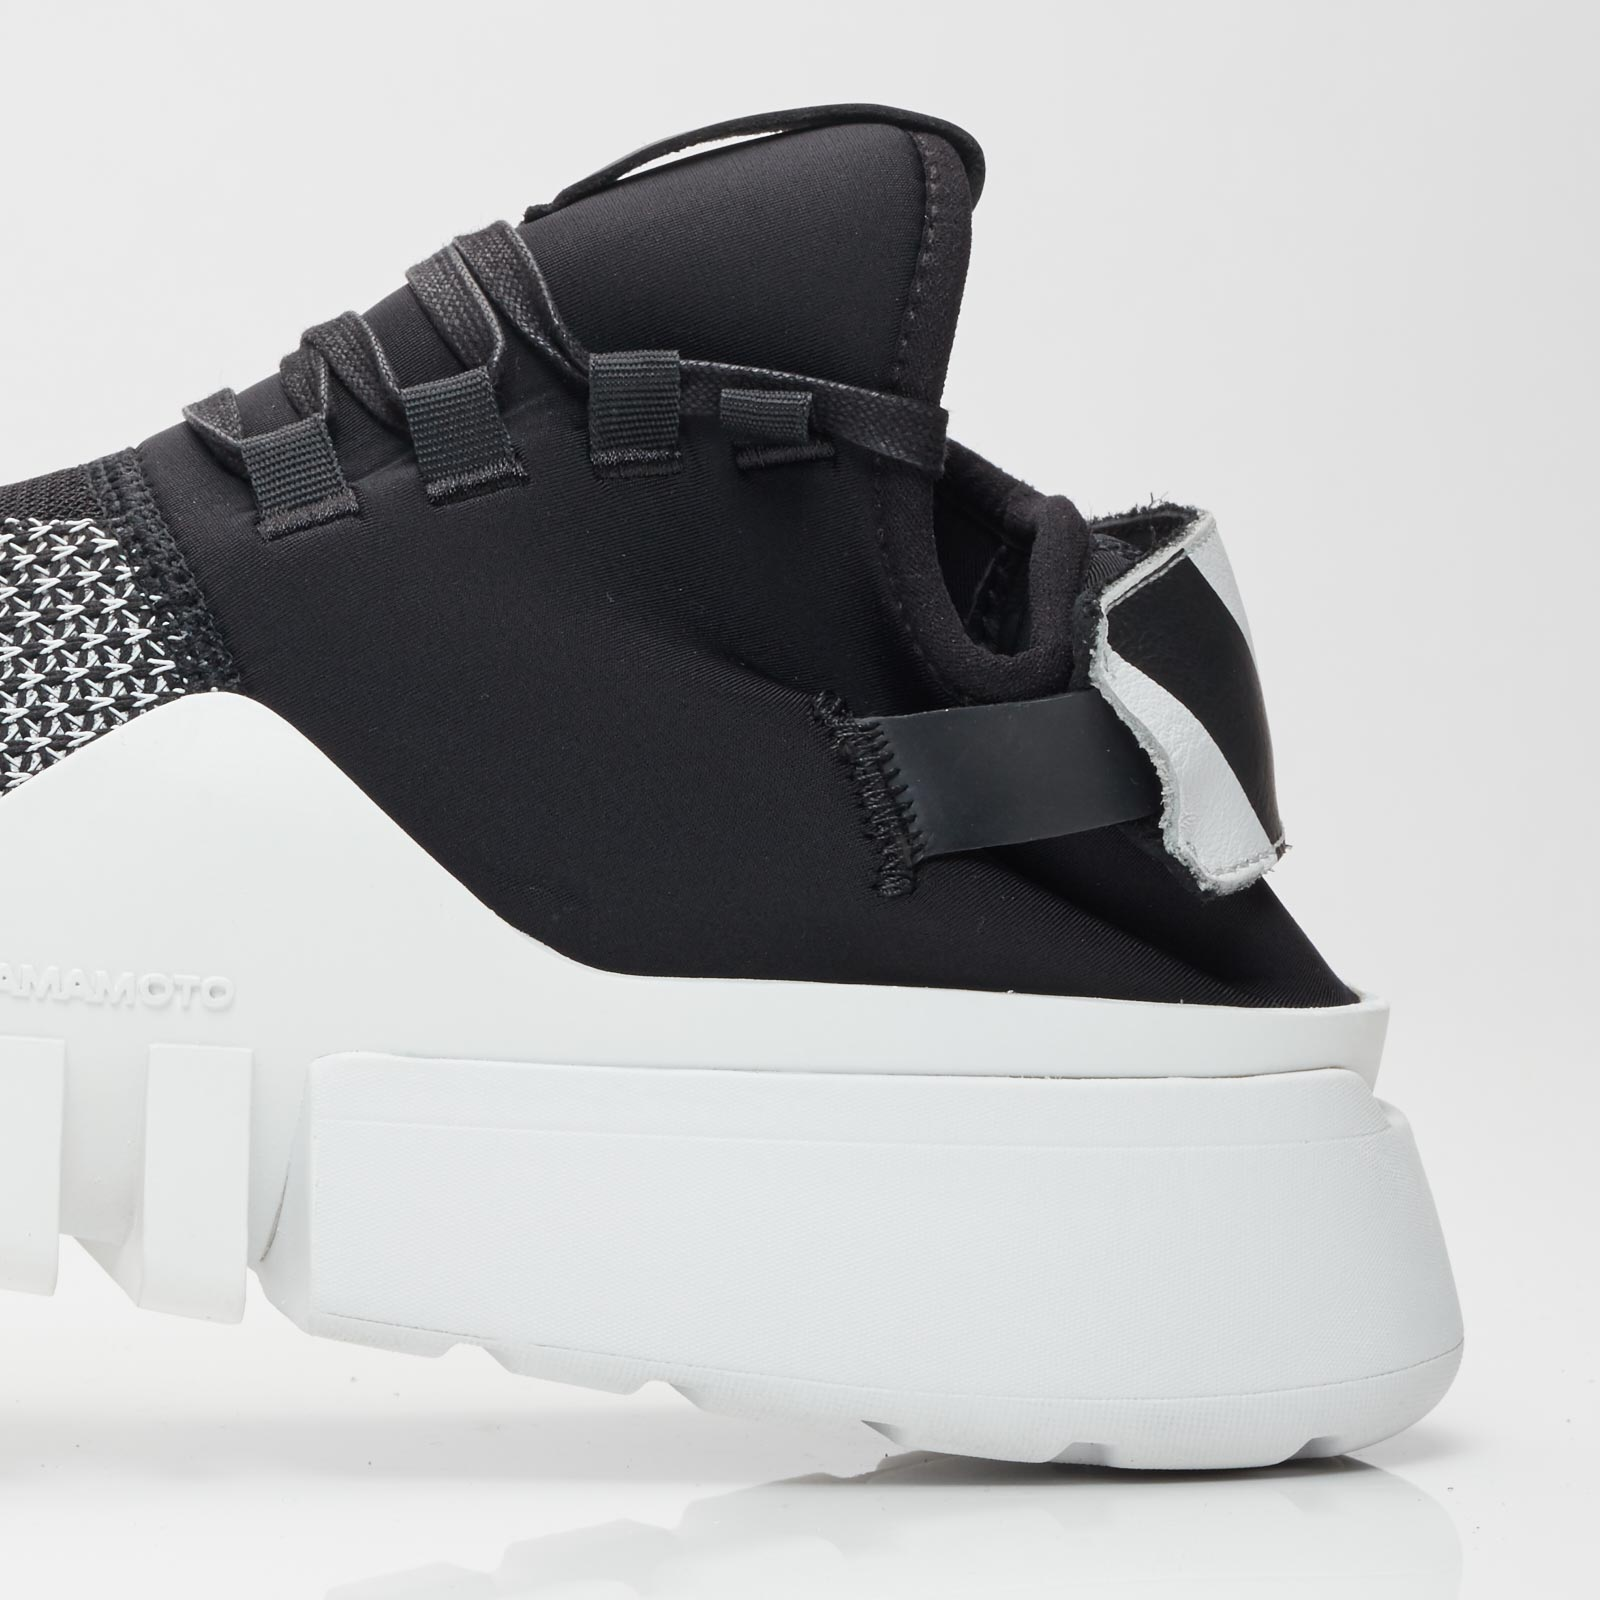 5e746cf7c adidas Ayero - Cg3169 - Sneakersnstuff